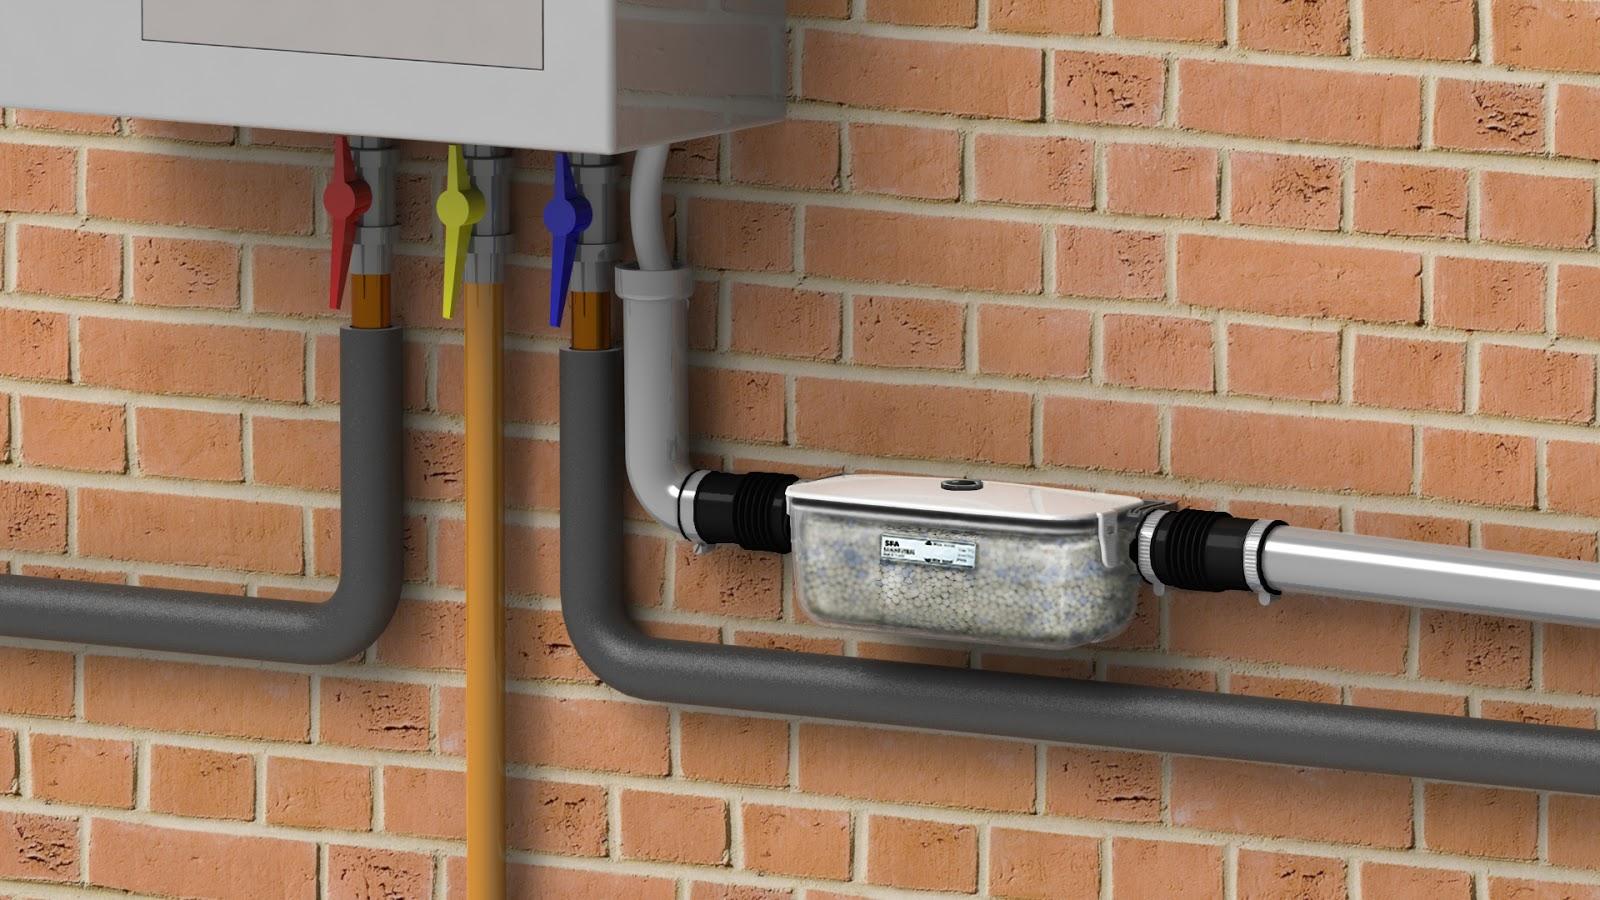 Chaudi re condensation faut il traiter les condensats - Pompe a chaleur ou chaudiere a condensation ...